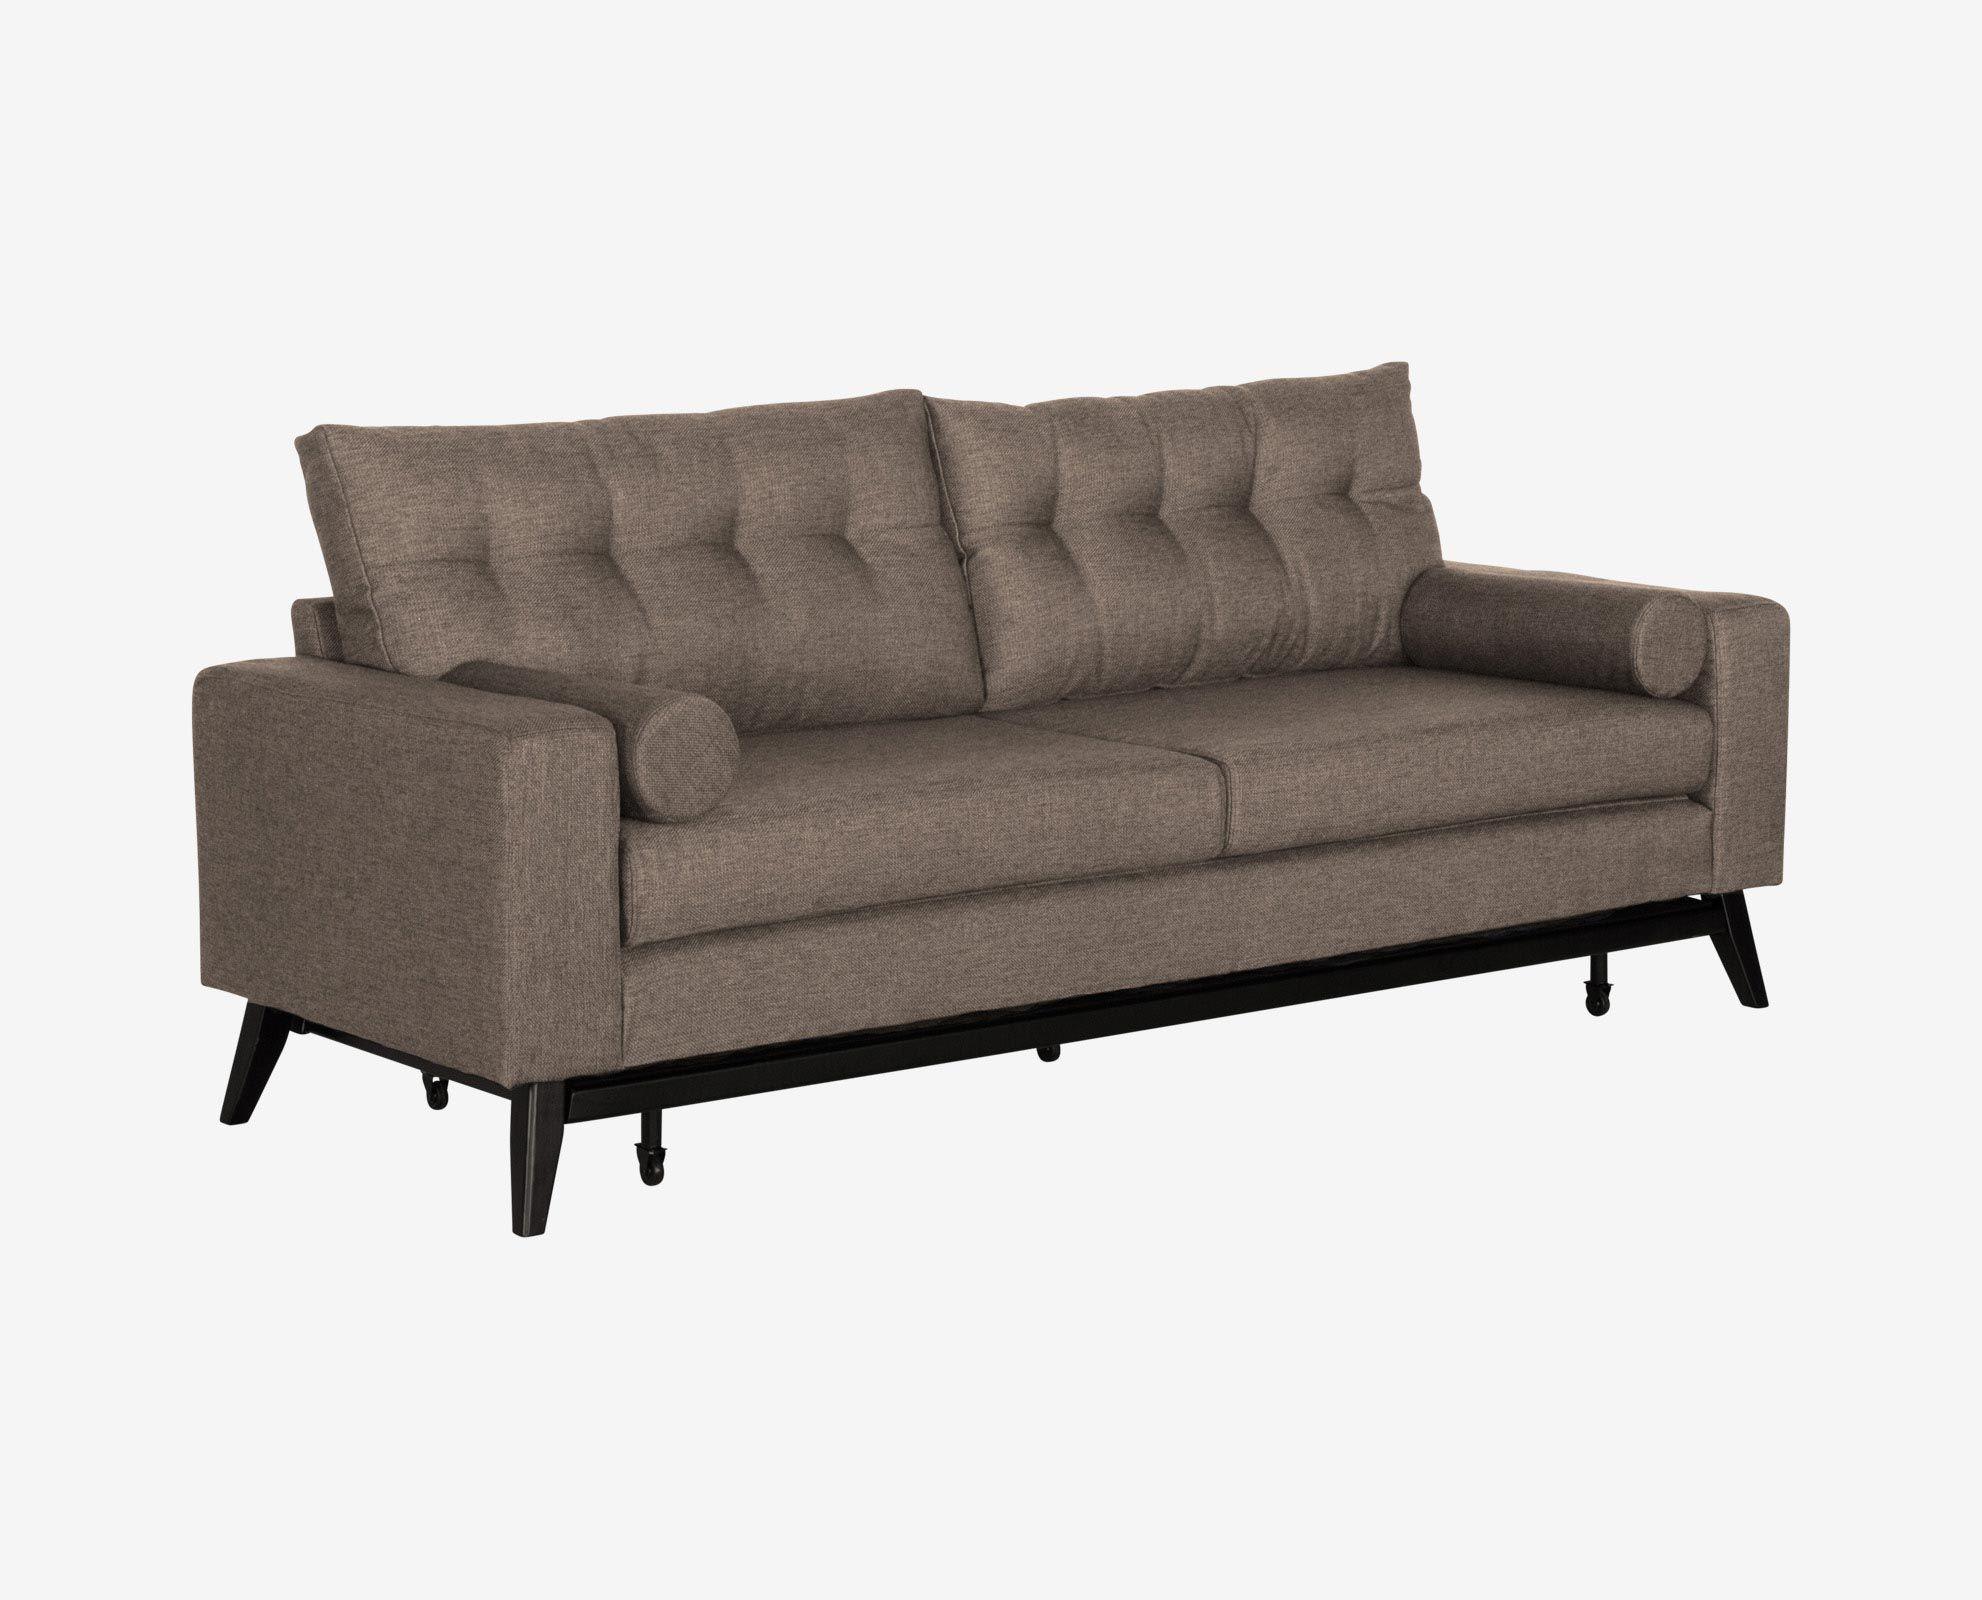 $599 Kenora Sleeper Sofa Living room furniture